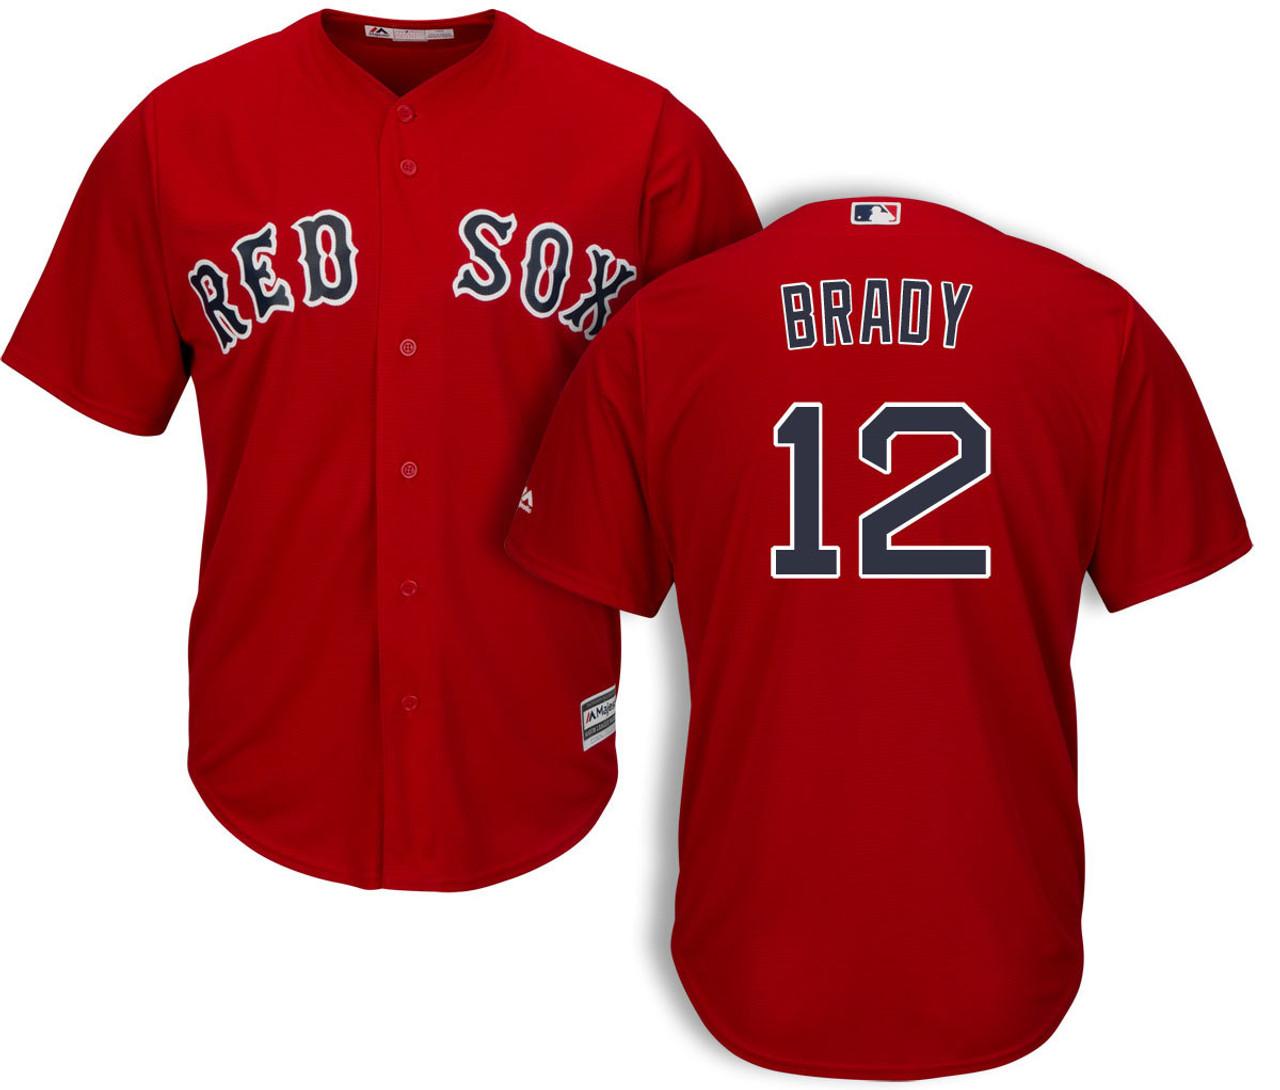 the best attitude b5638 ca167 Tom Brady Jerseys & Shirts | Red Sox MLB Apparel